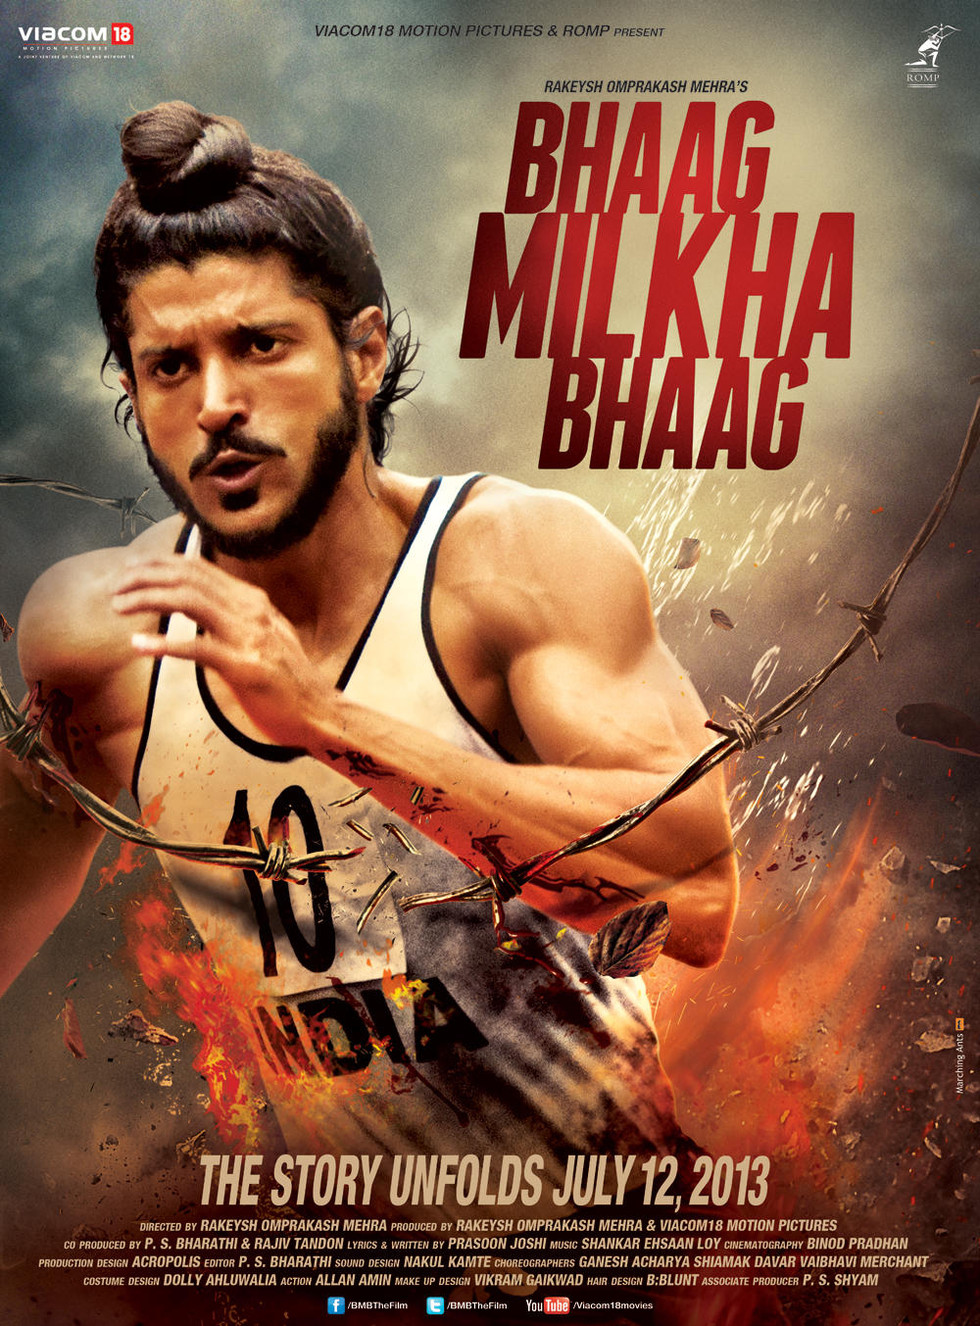 Bhaag Milkha Bhaag - Movie Poster #1 (Large)